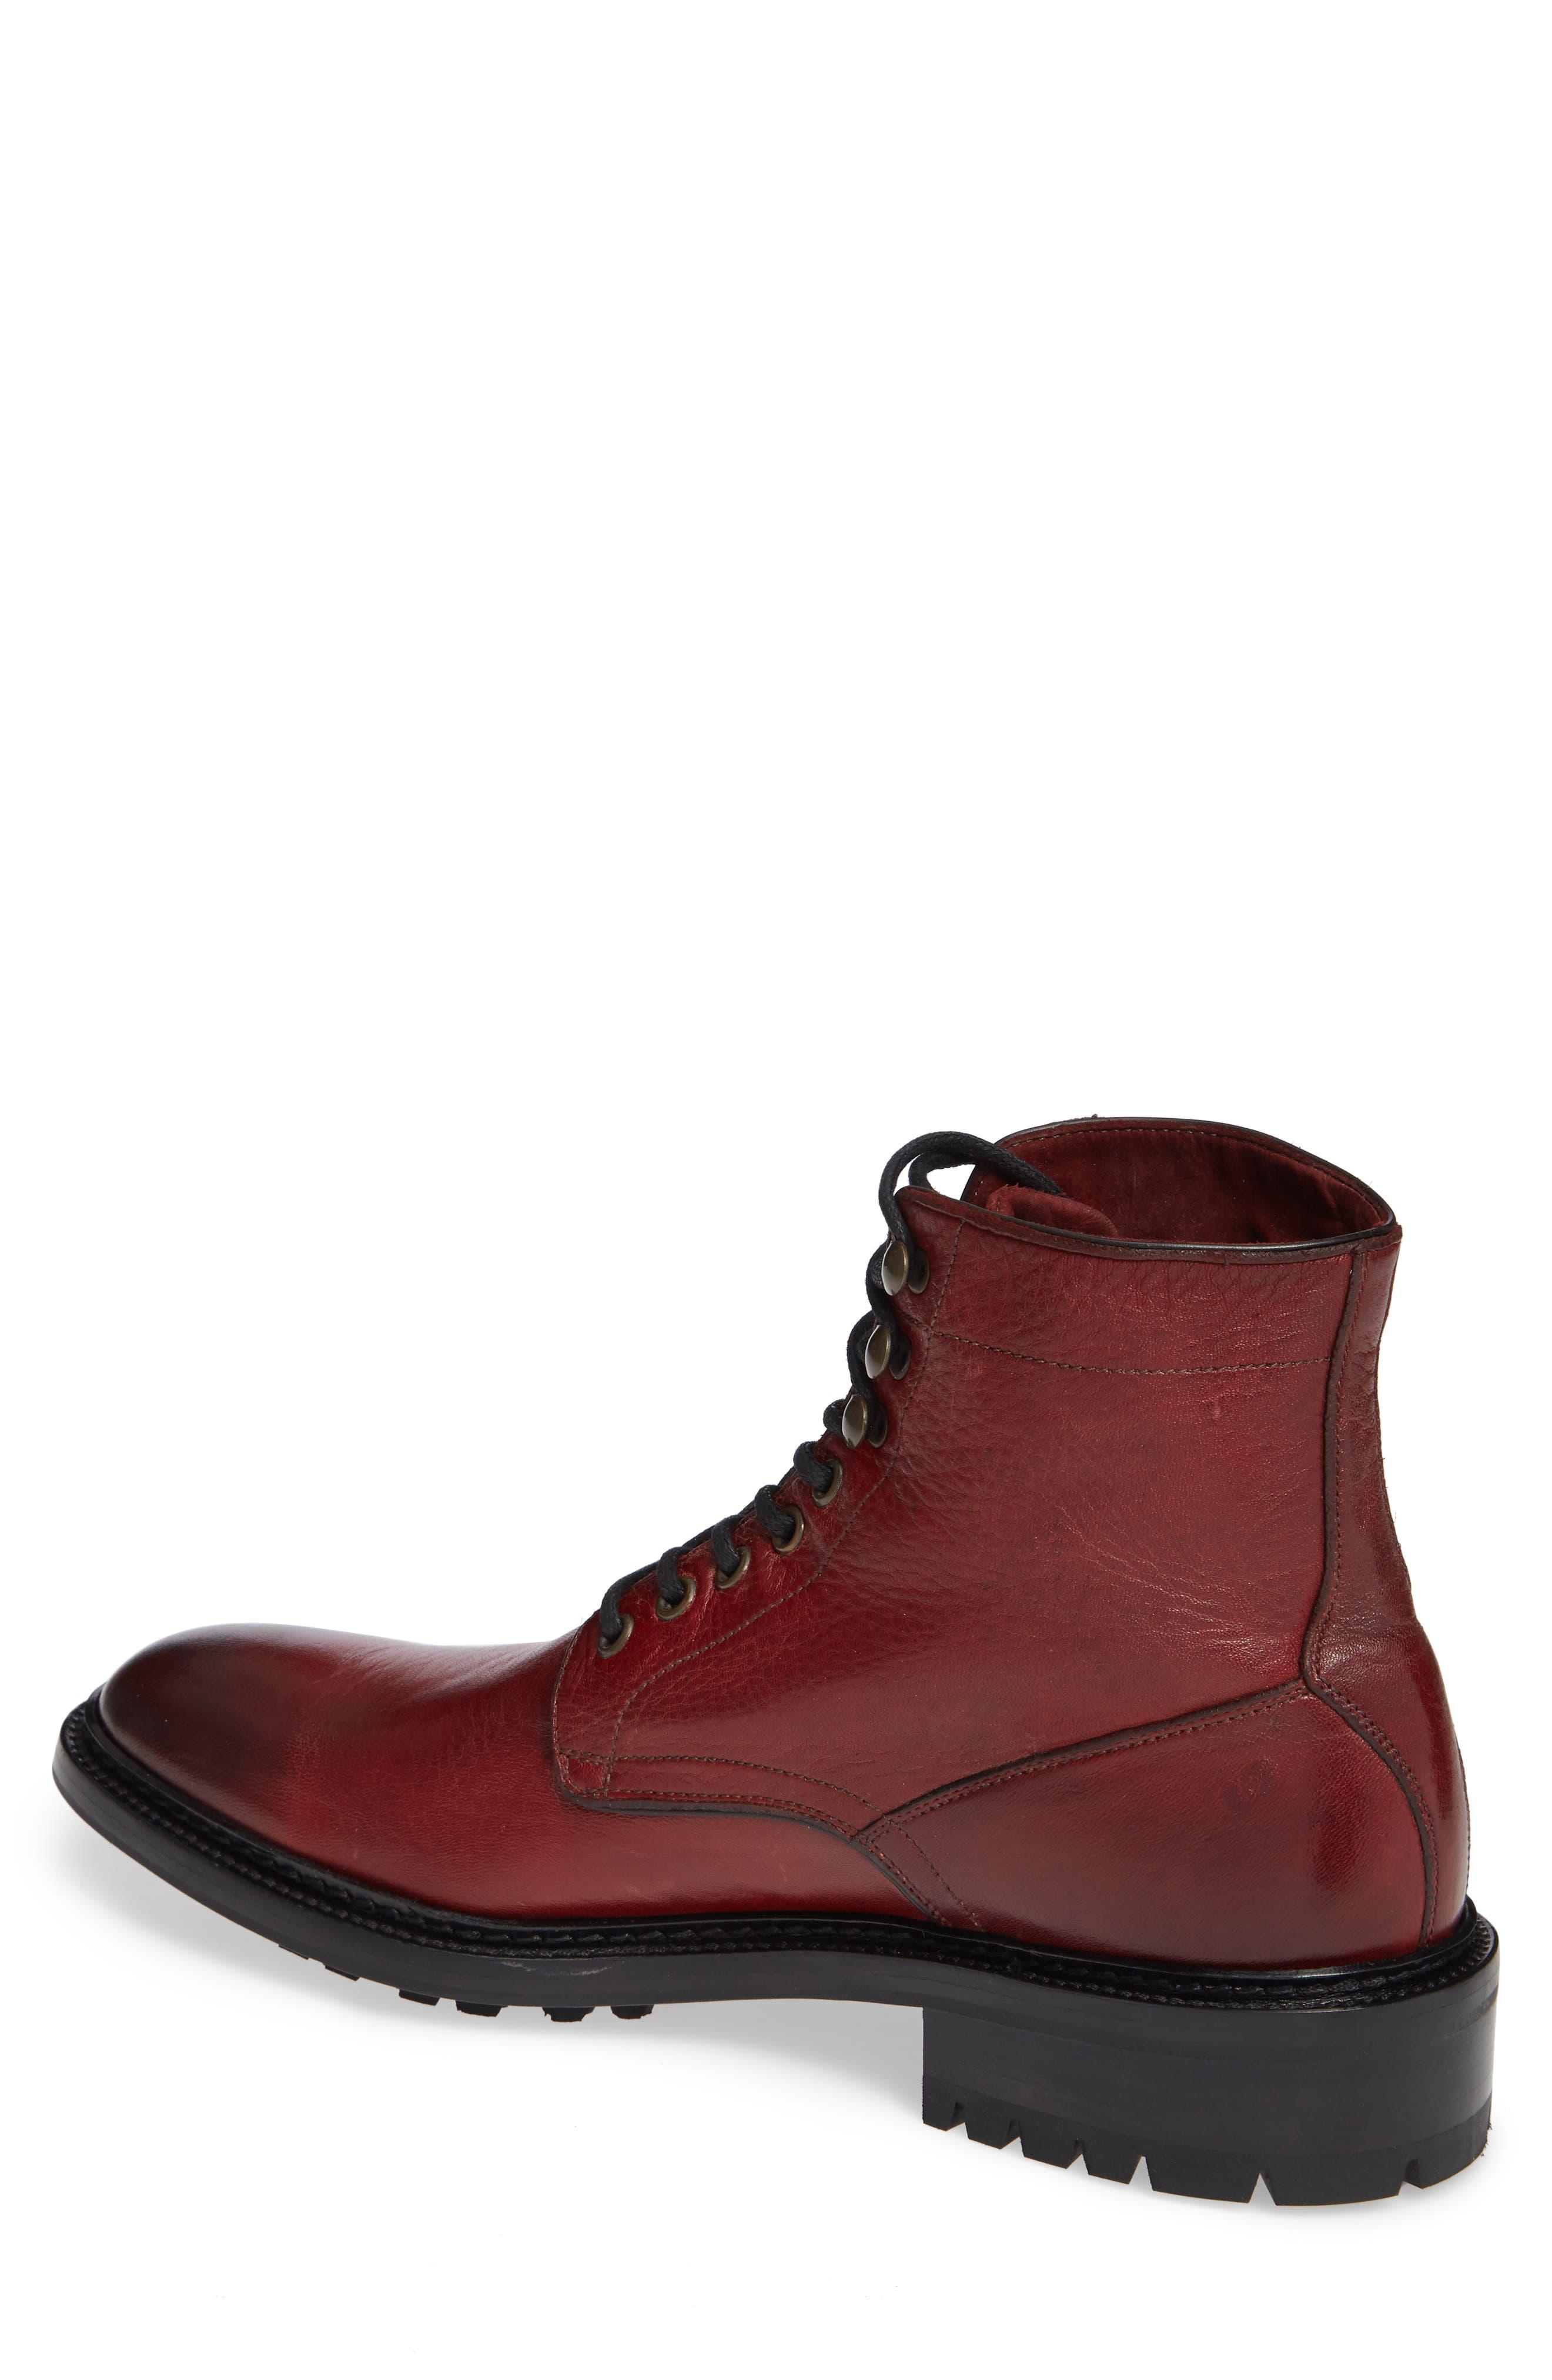 Greyson Plain Toe Boot,                             Alternate thumbnail 2, color,                             BURGUNDY